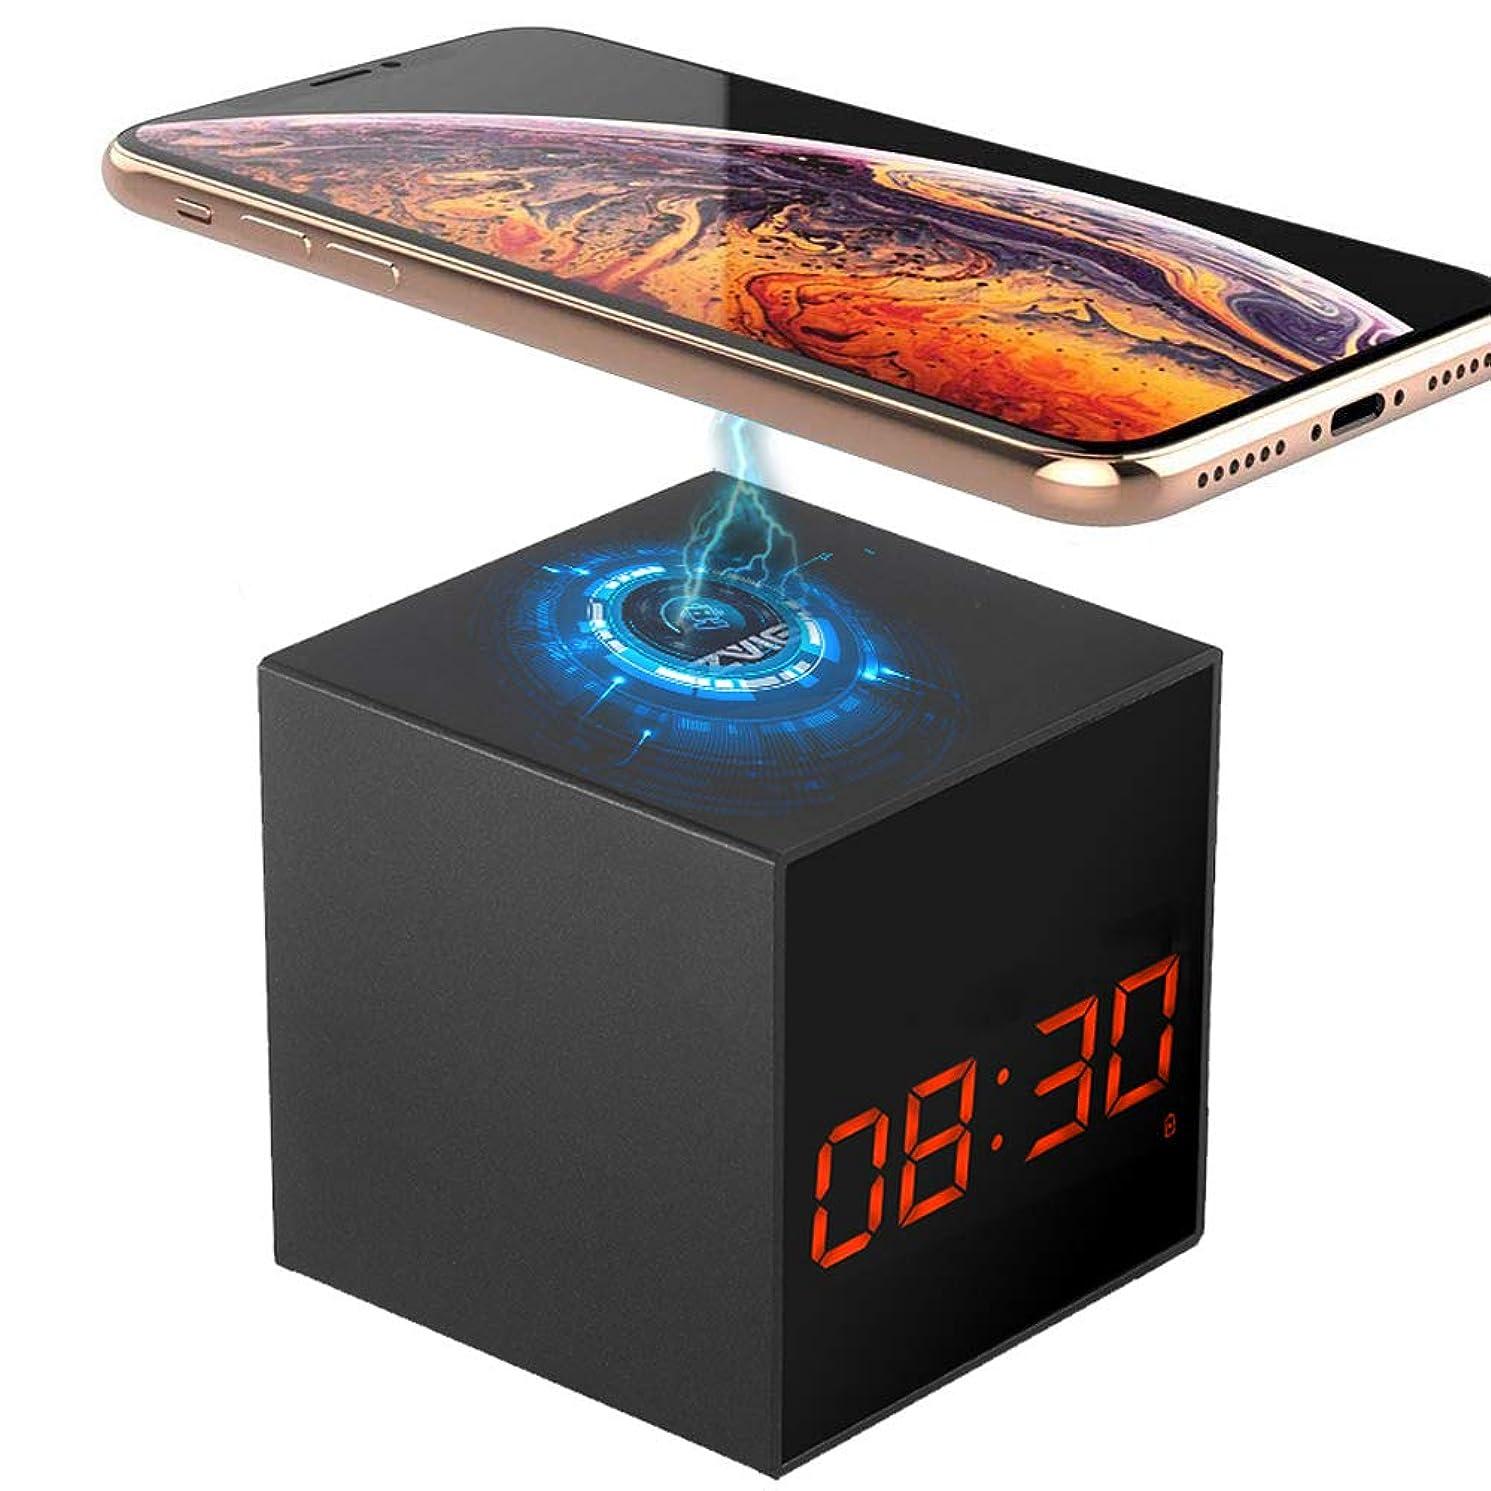 LIZVIE Hidden Spy Cube Clock Nanny Camera with Enhanced Night Vision,Motion Detection, Invisible Lens, Video Recorder, 12&24 Alarm Clock (Wireless Base)